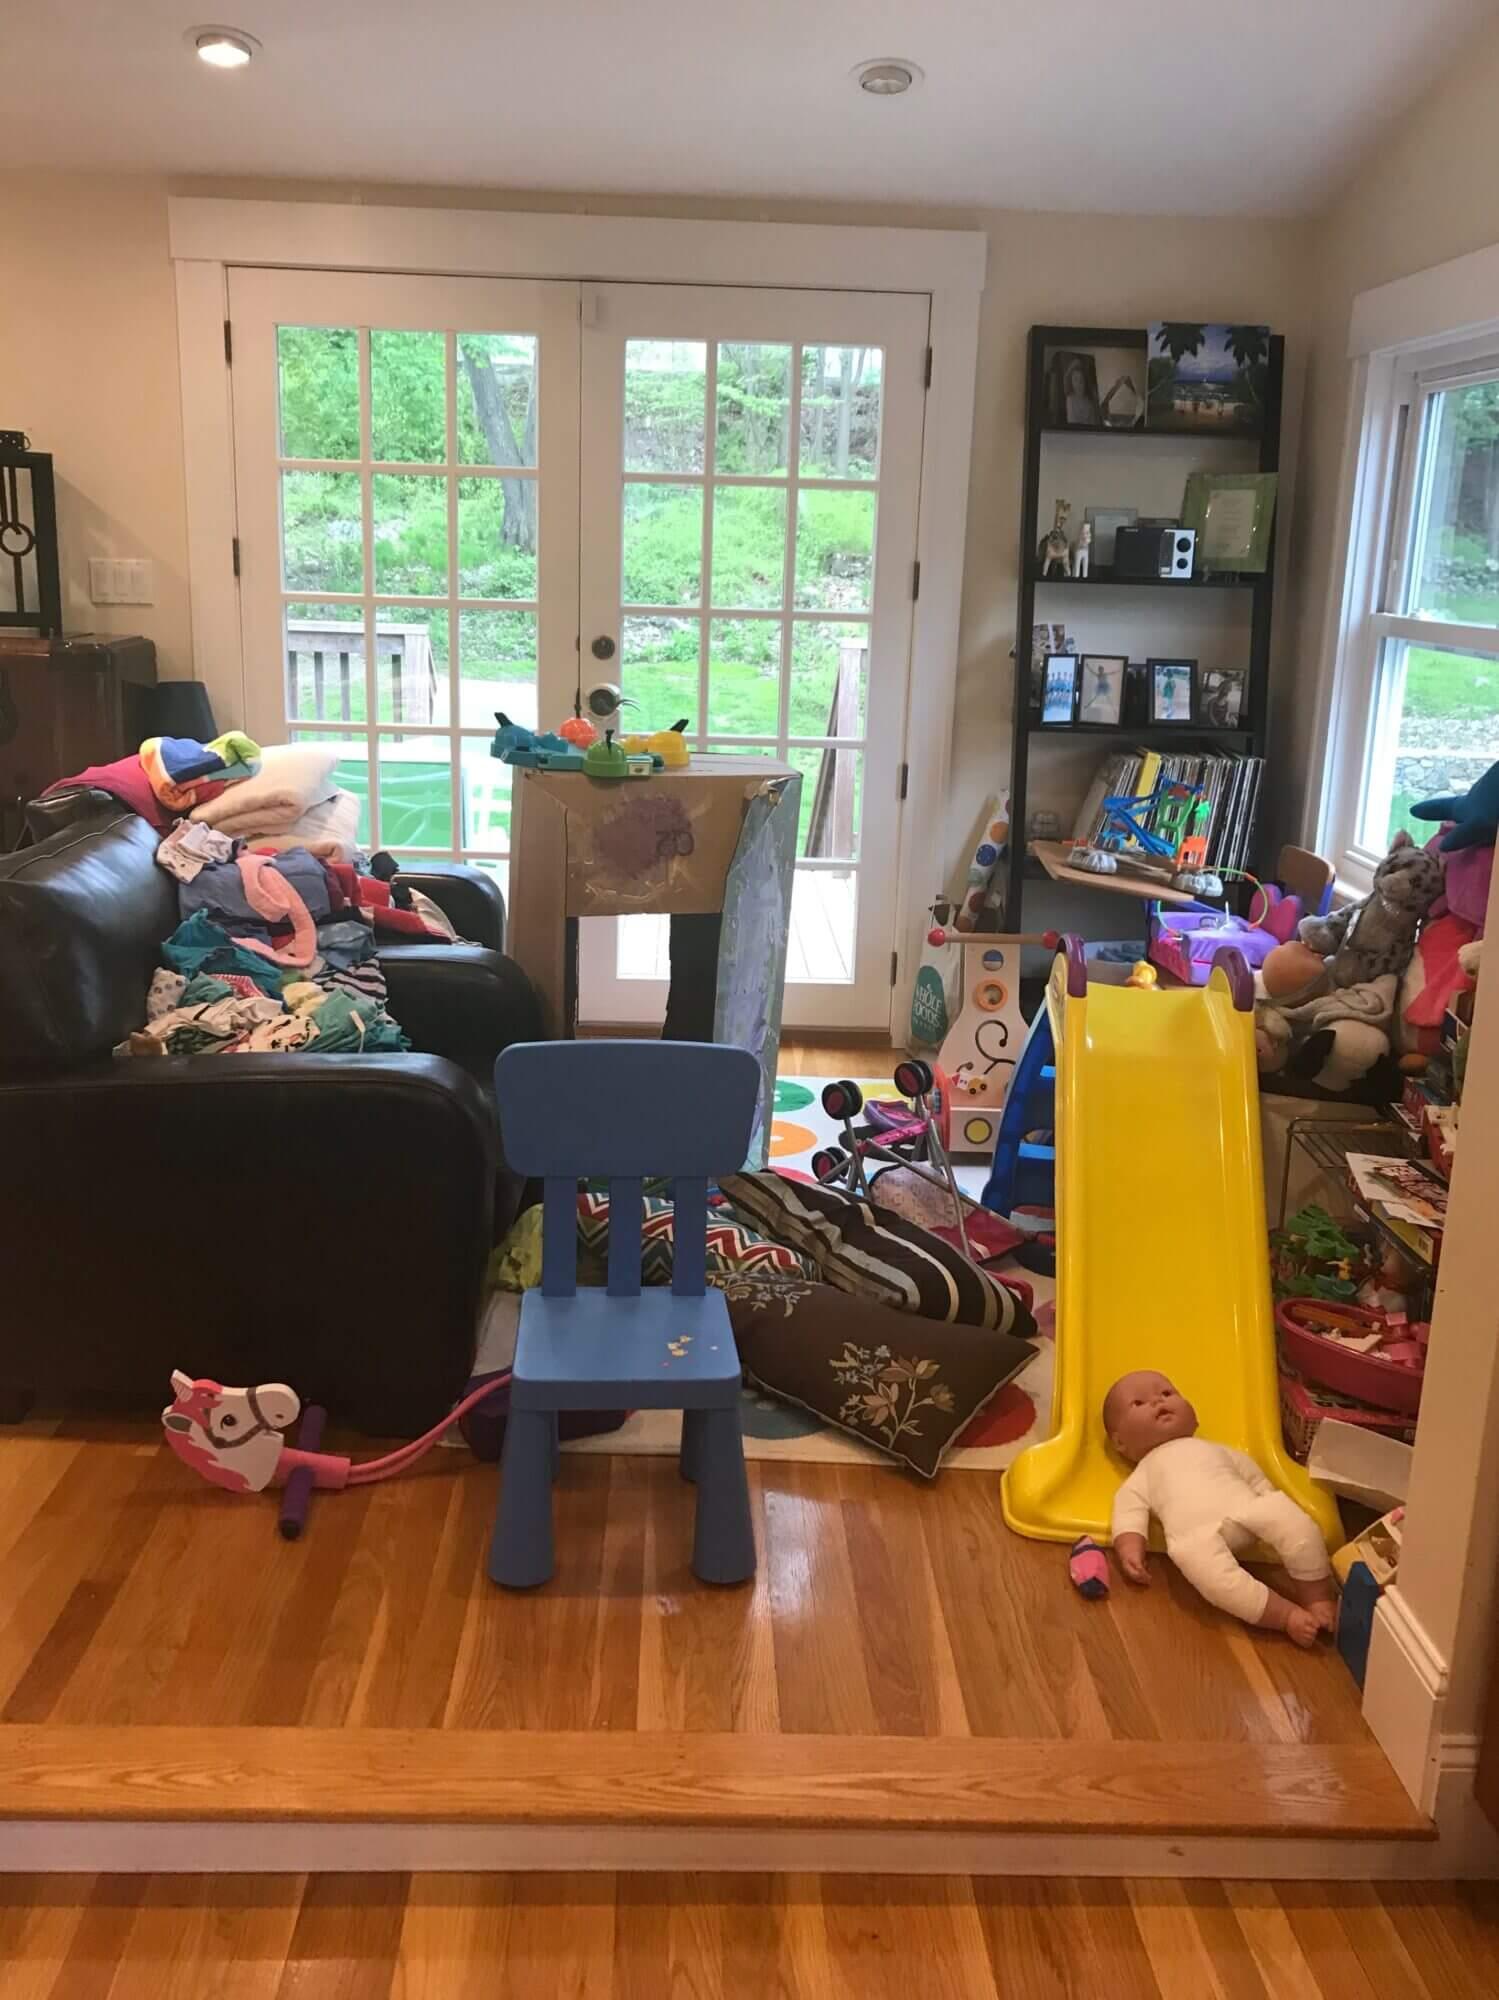 Before photo of disorganized play area